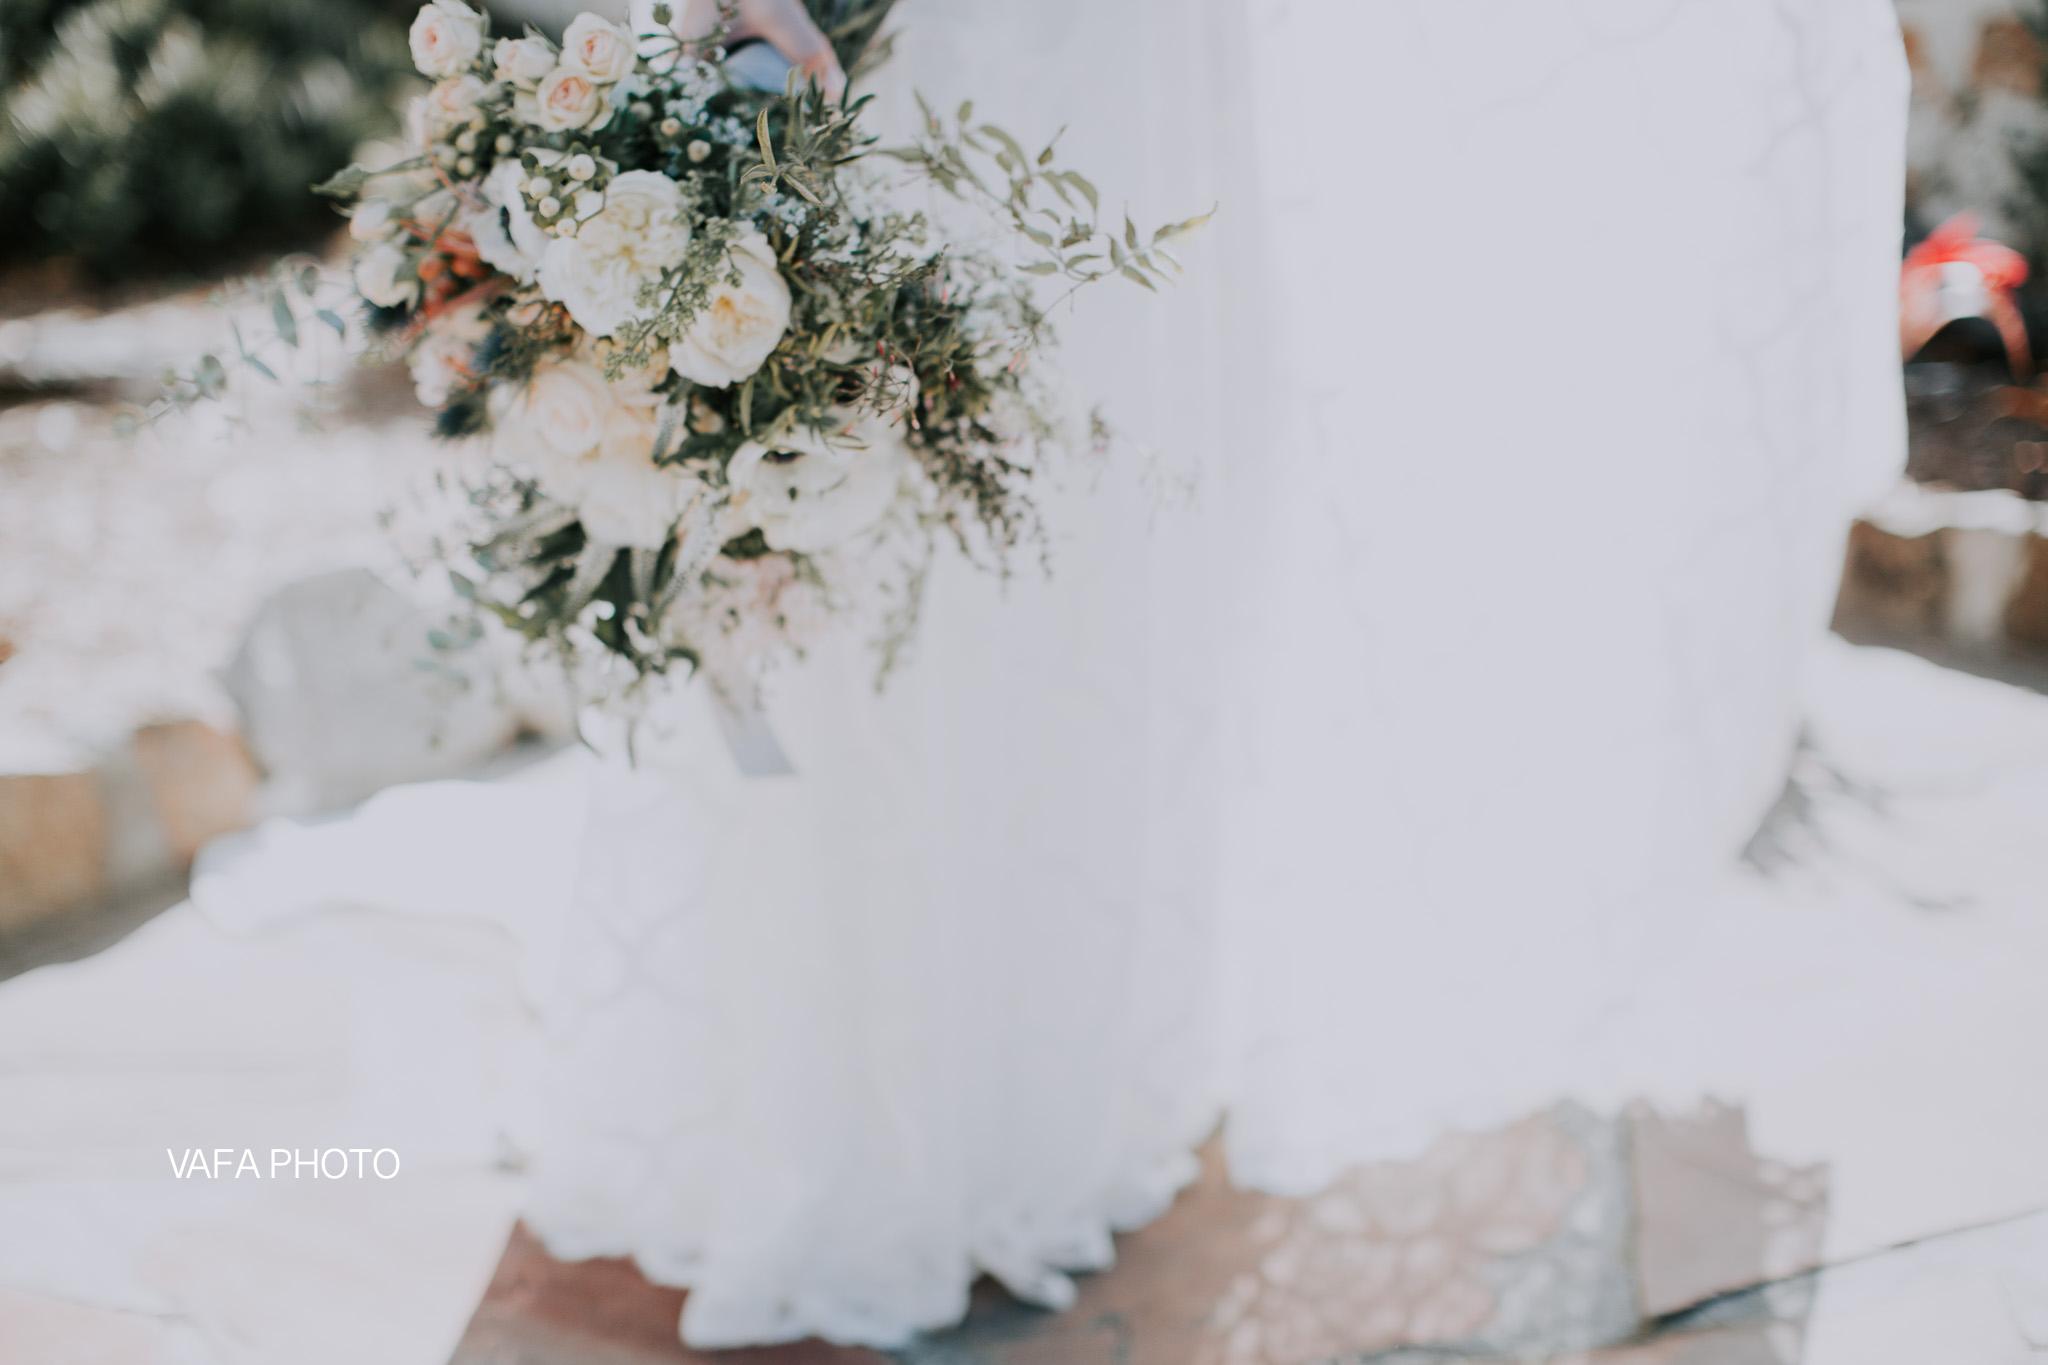 Leo-Carrillo-Ranch-Wedding-Lauren-Mike-Vafa-Photo-335.jpg